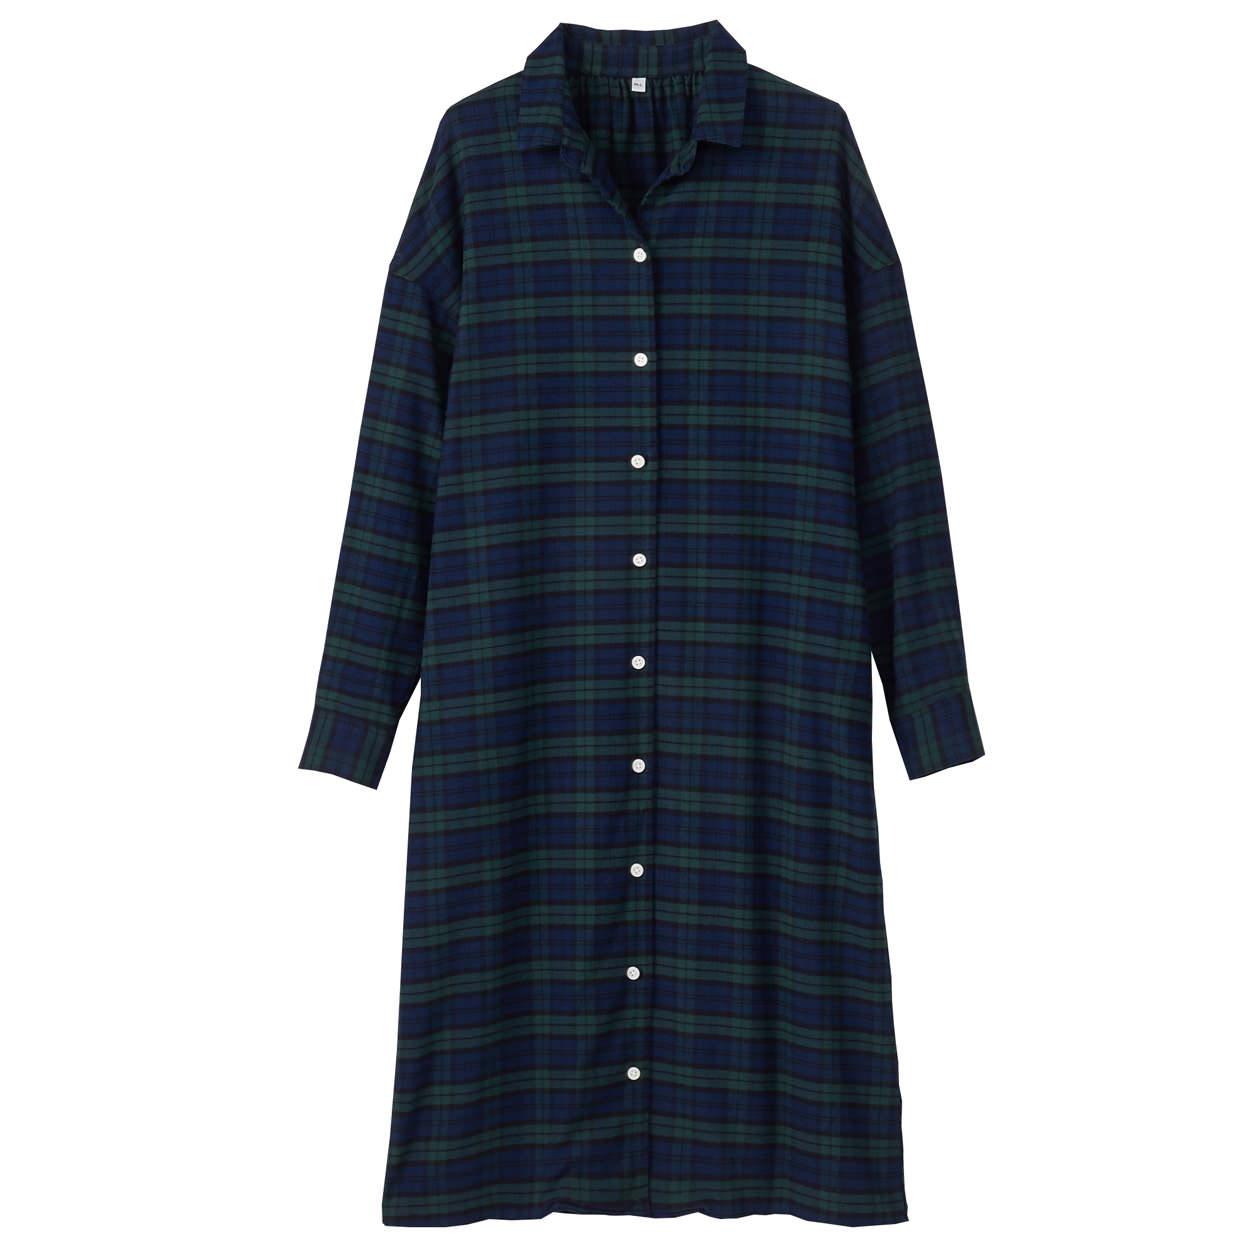 Ladies' Flannel Series, U.P. $33-$59 (30% OFF)